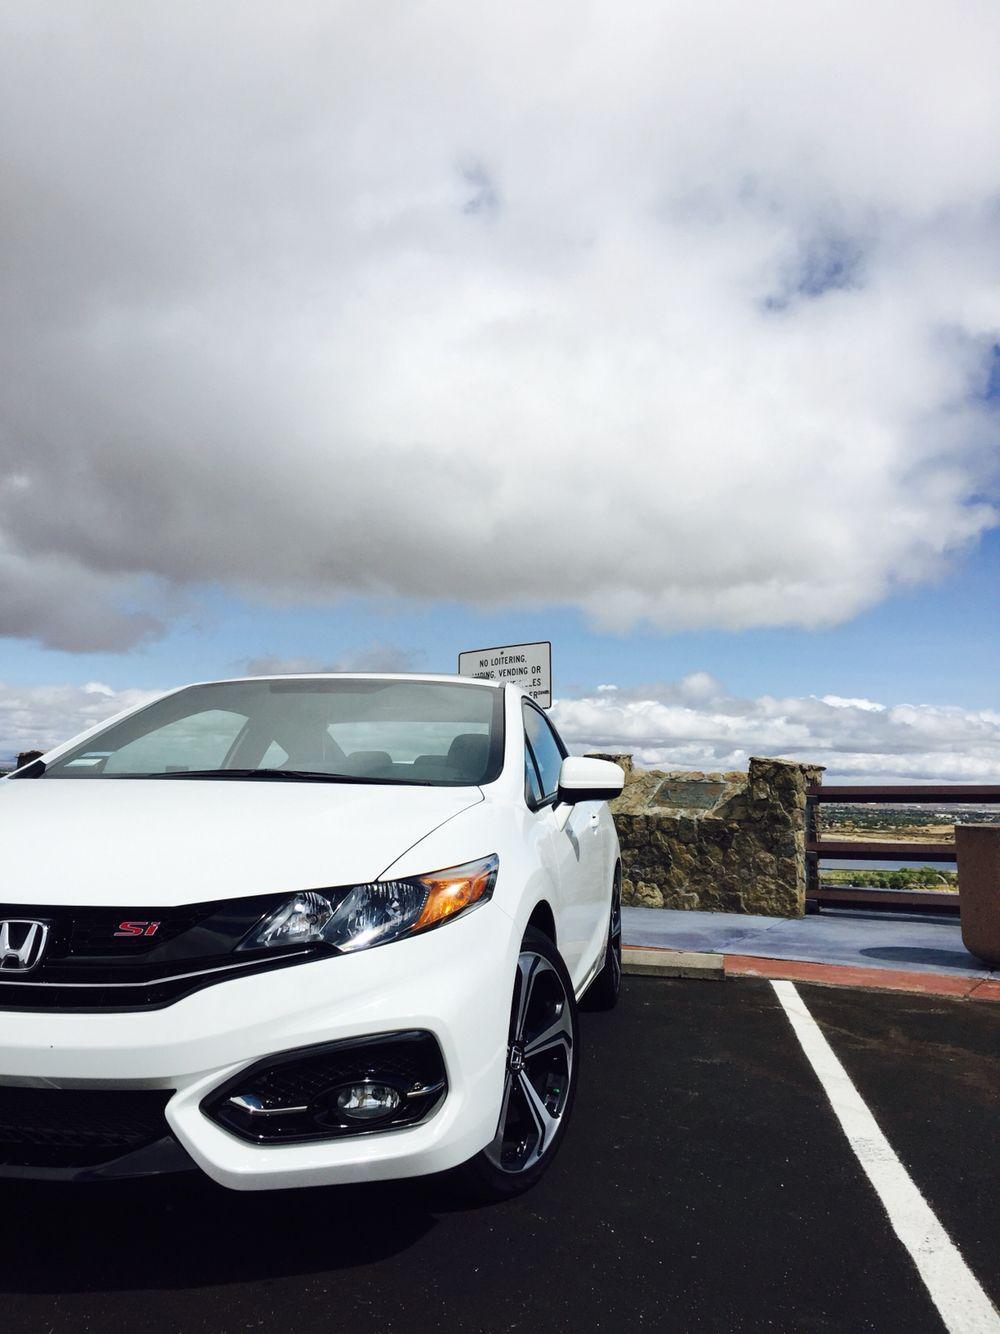 2015 Honda CIVIC Si FG4 2015 honda civic, Honda civic si